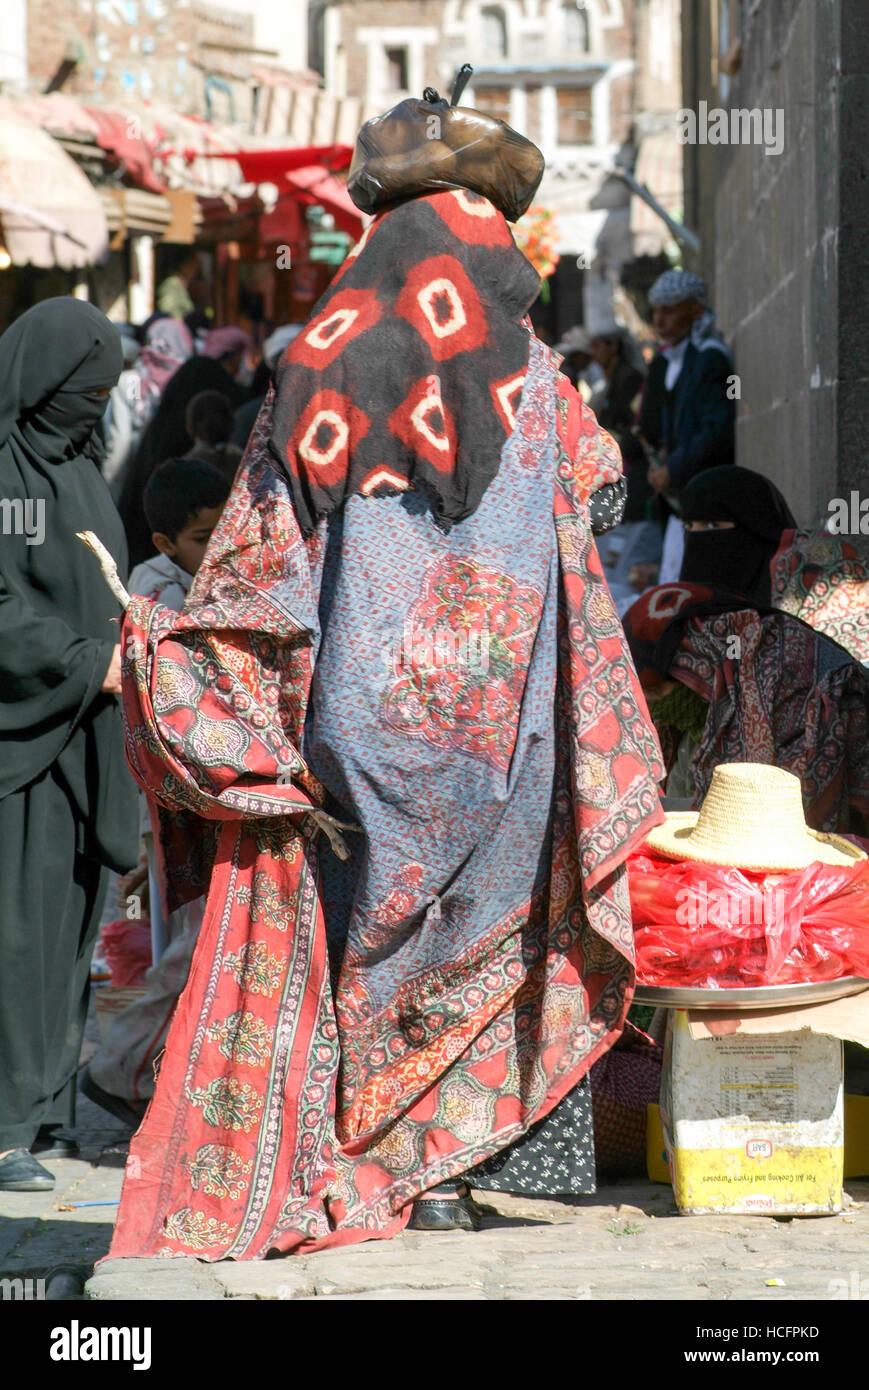 Sana, Yemen - 19 January 2008: women wearing the burqa and walking on the market of old Sana on Yemen - Stock Image